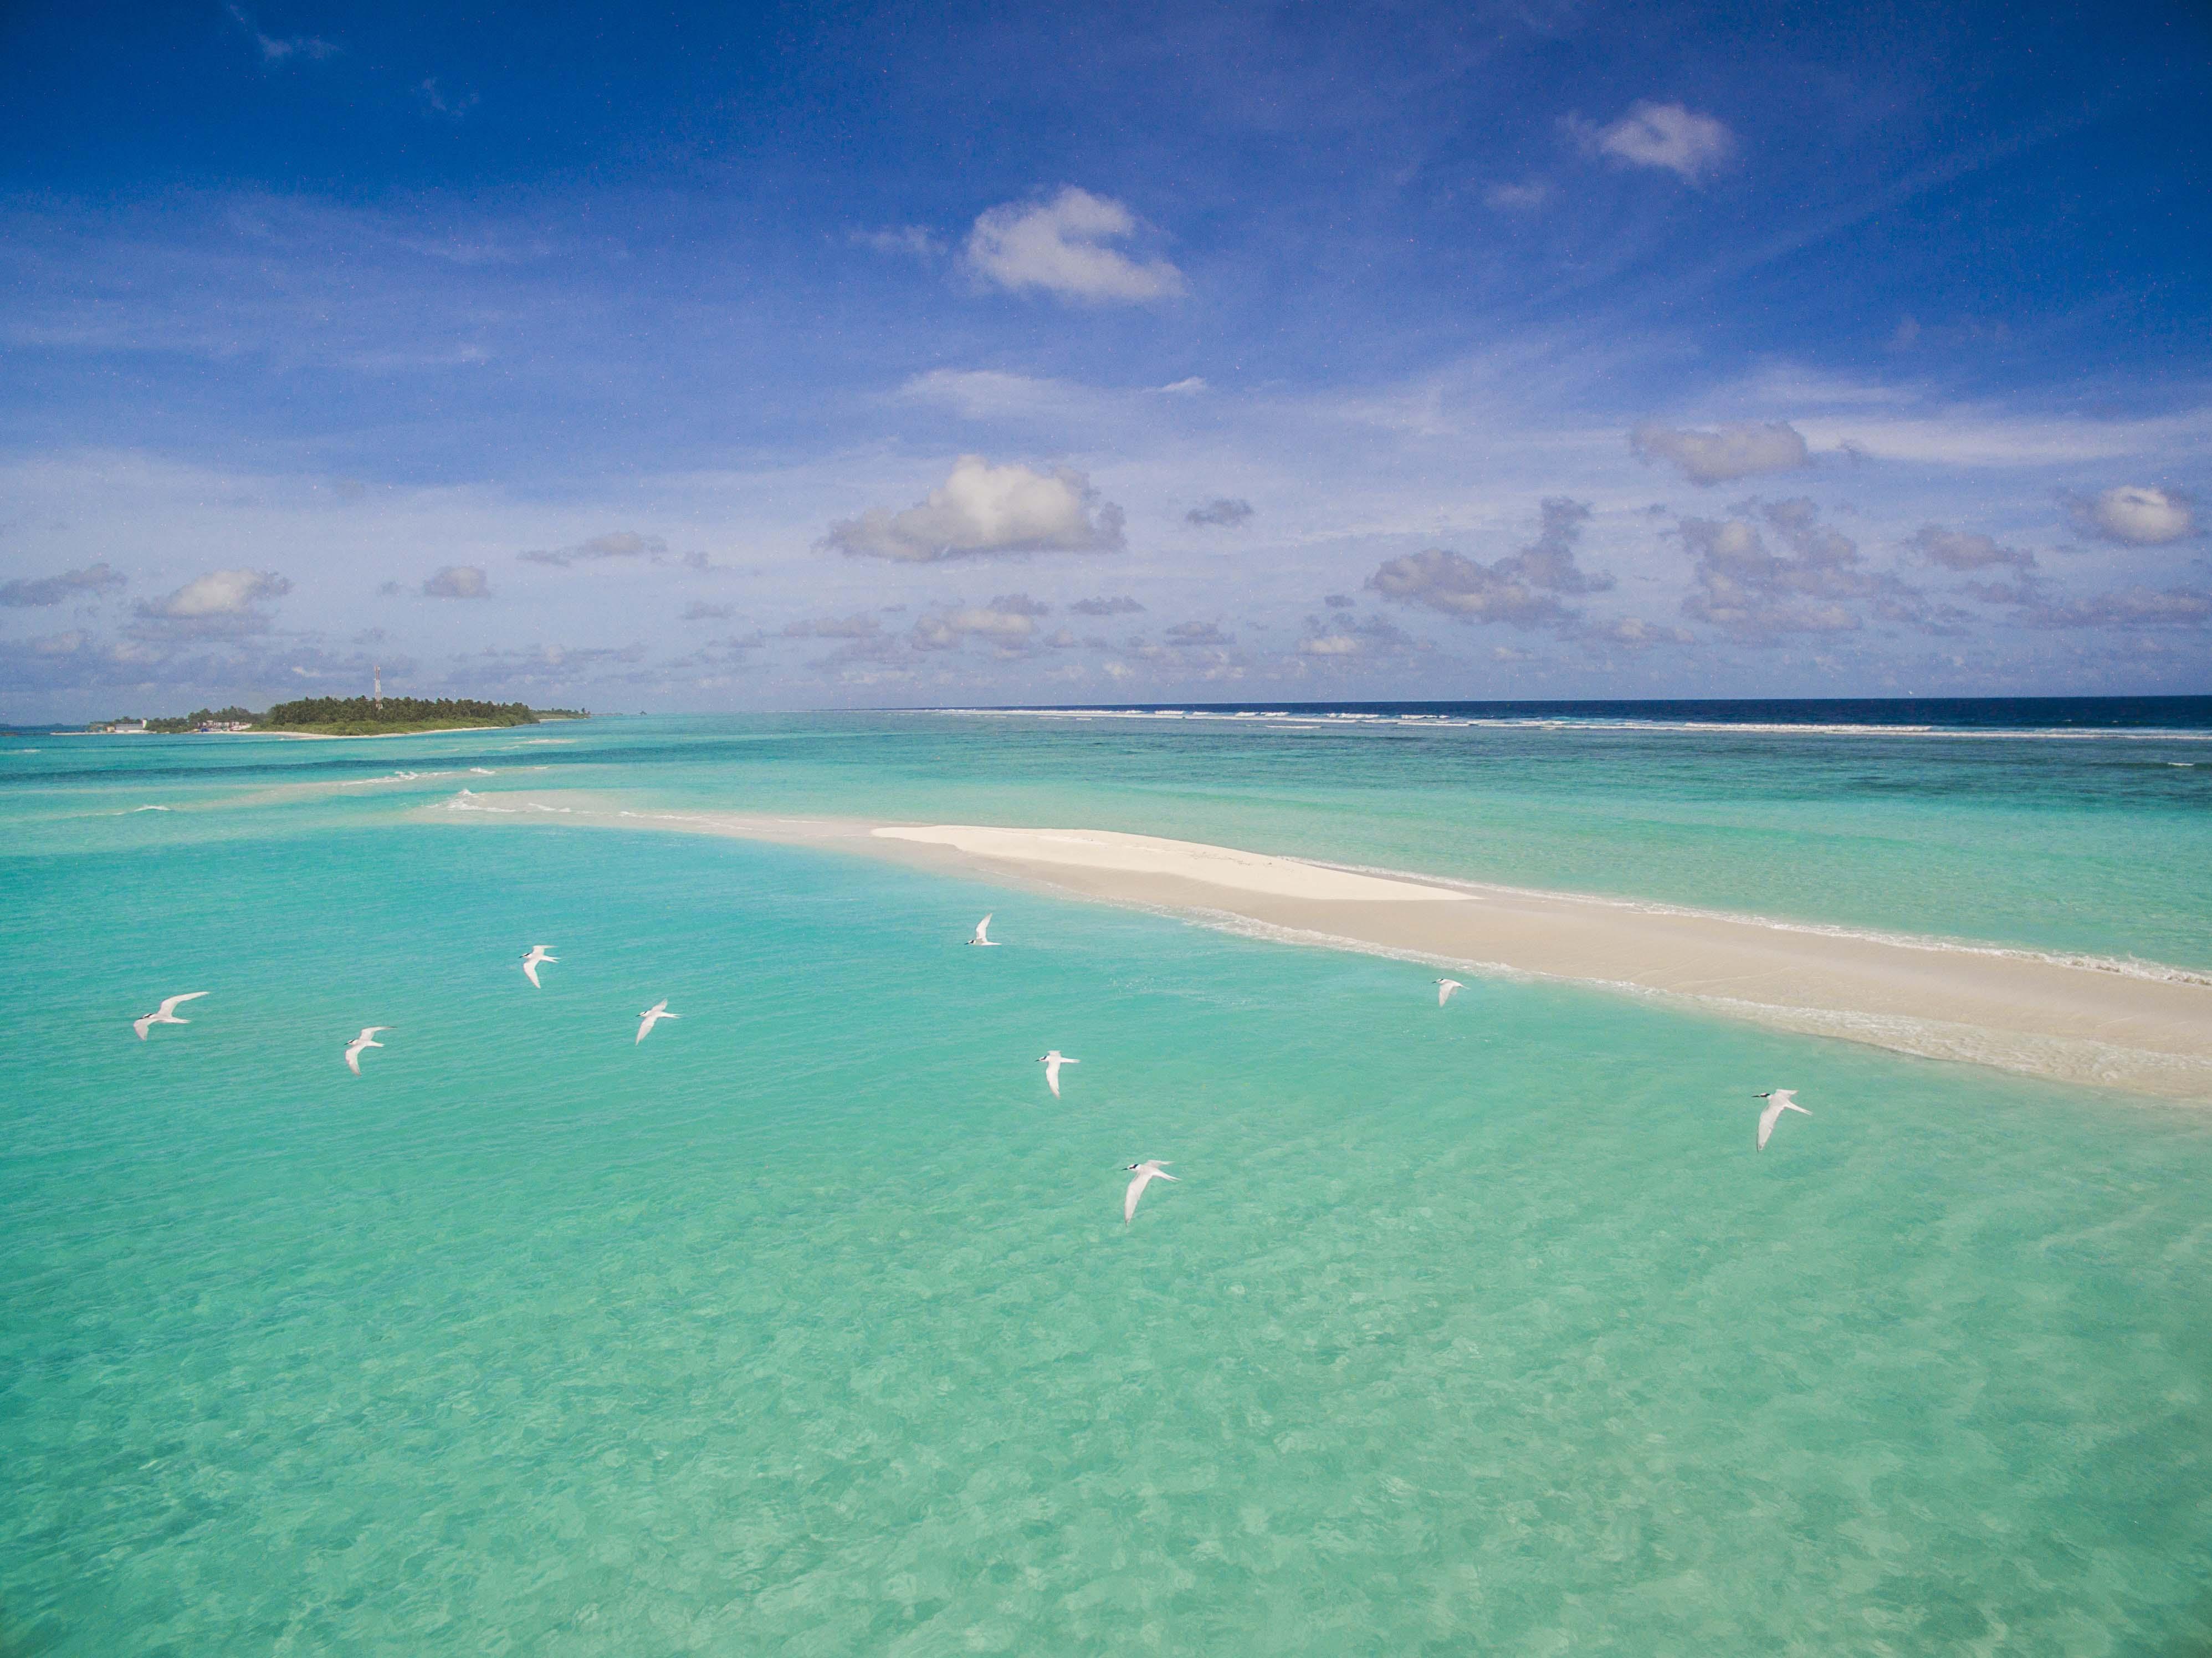 Lacabana Maldives Sand Bank (3)